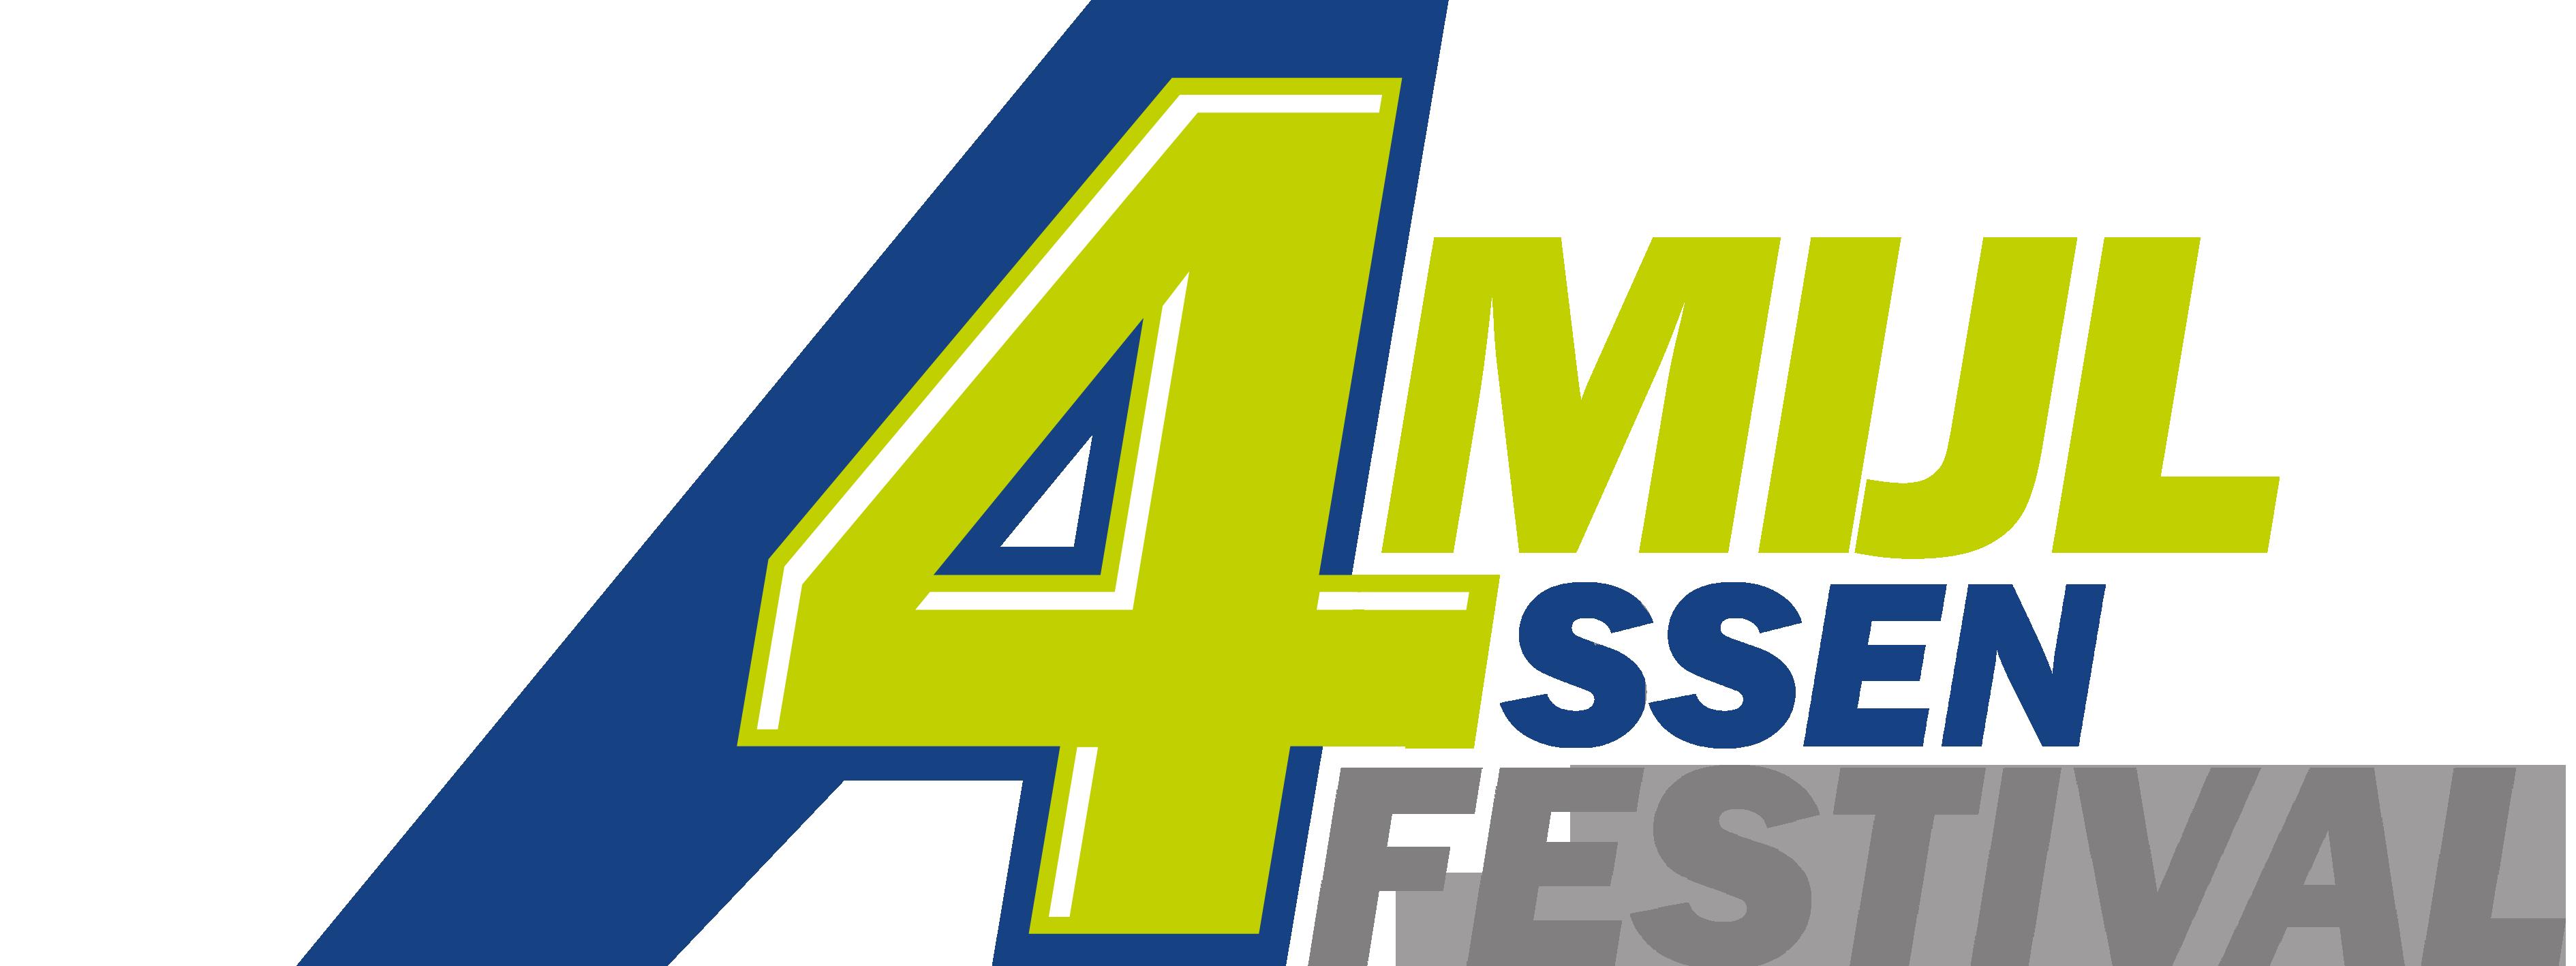 Logo 4 Mijl festival